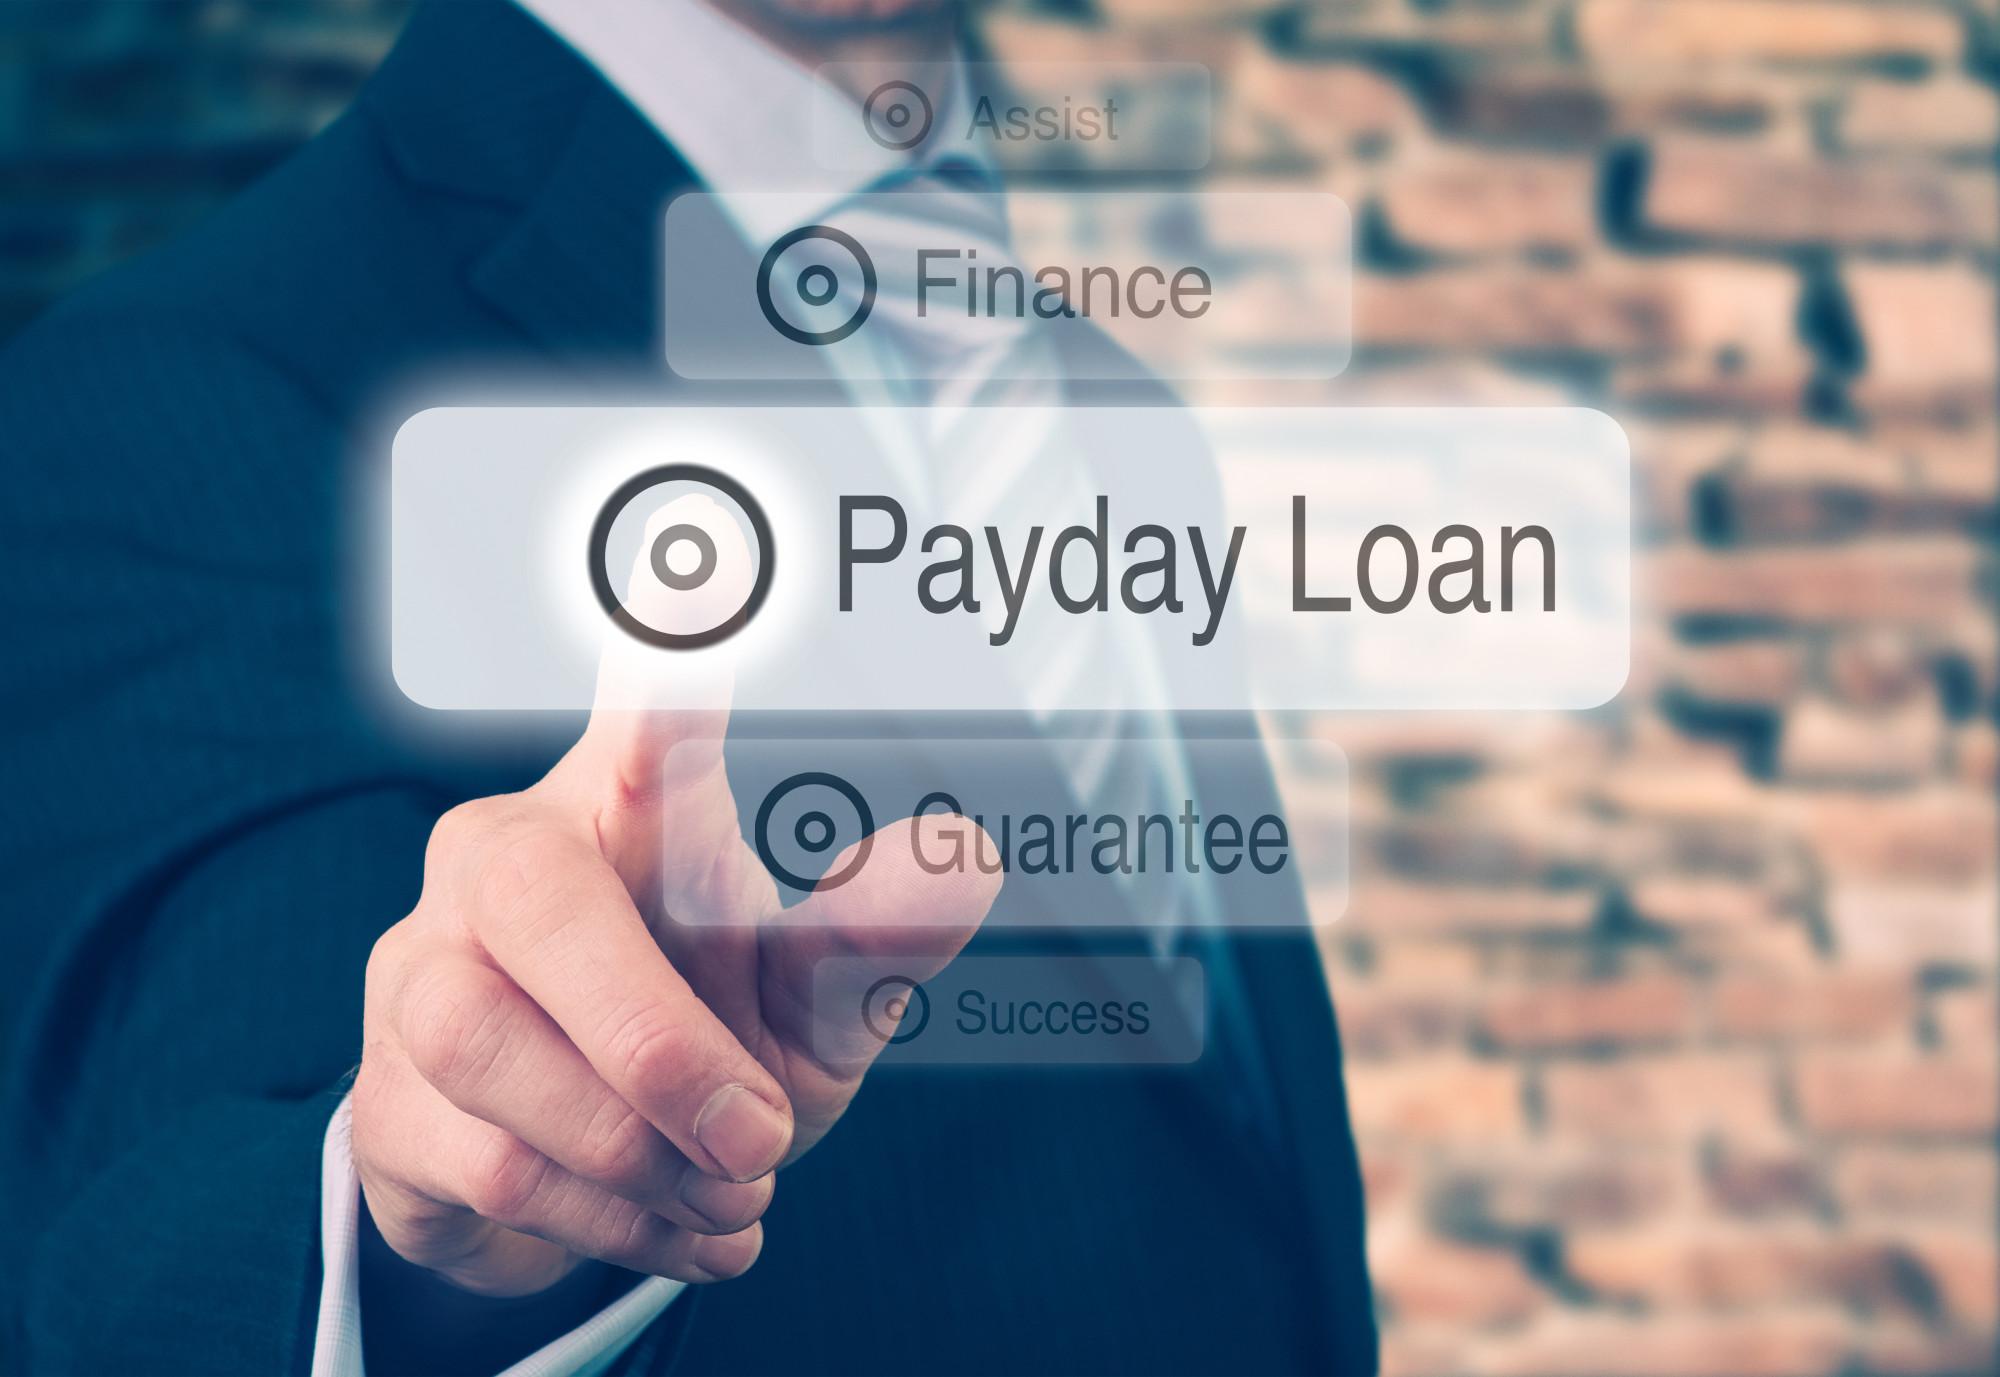 Payday Loan Online Lender